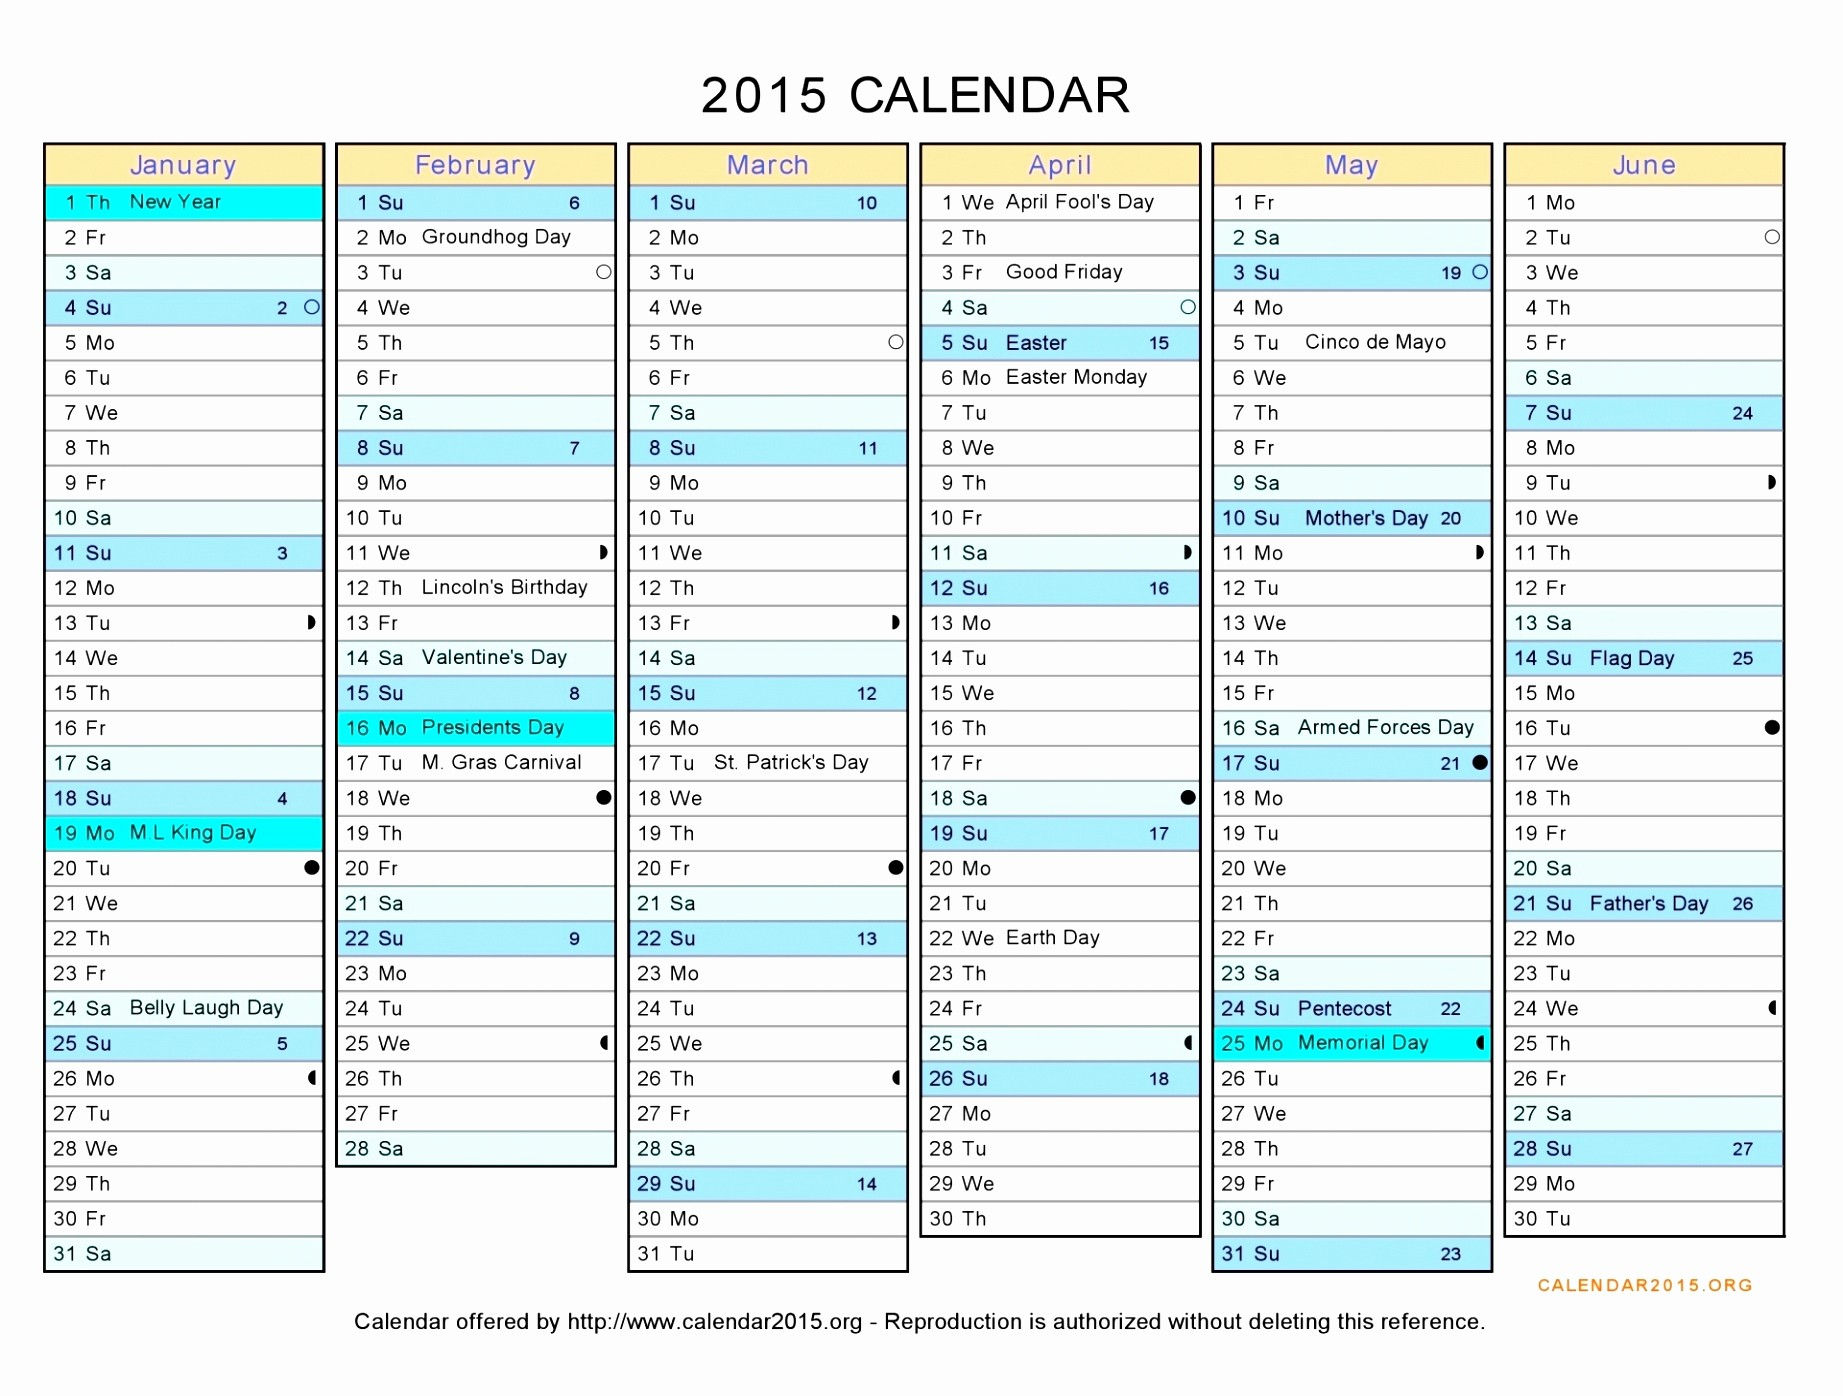 Calendar On Microsoft Word 2010 New 5 2015 Calendar Template Word 2010 Tubif